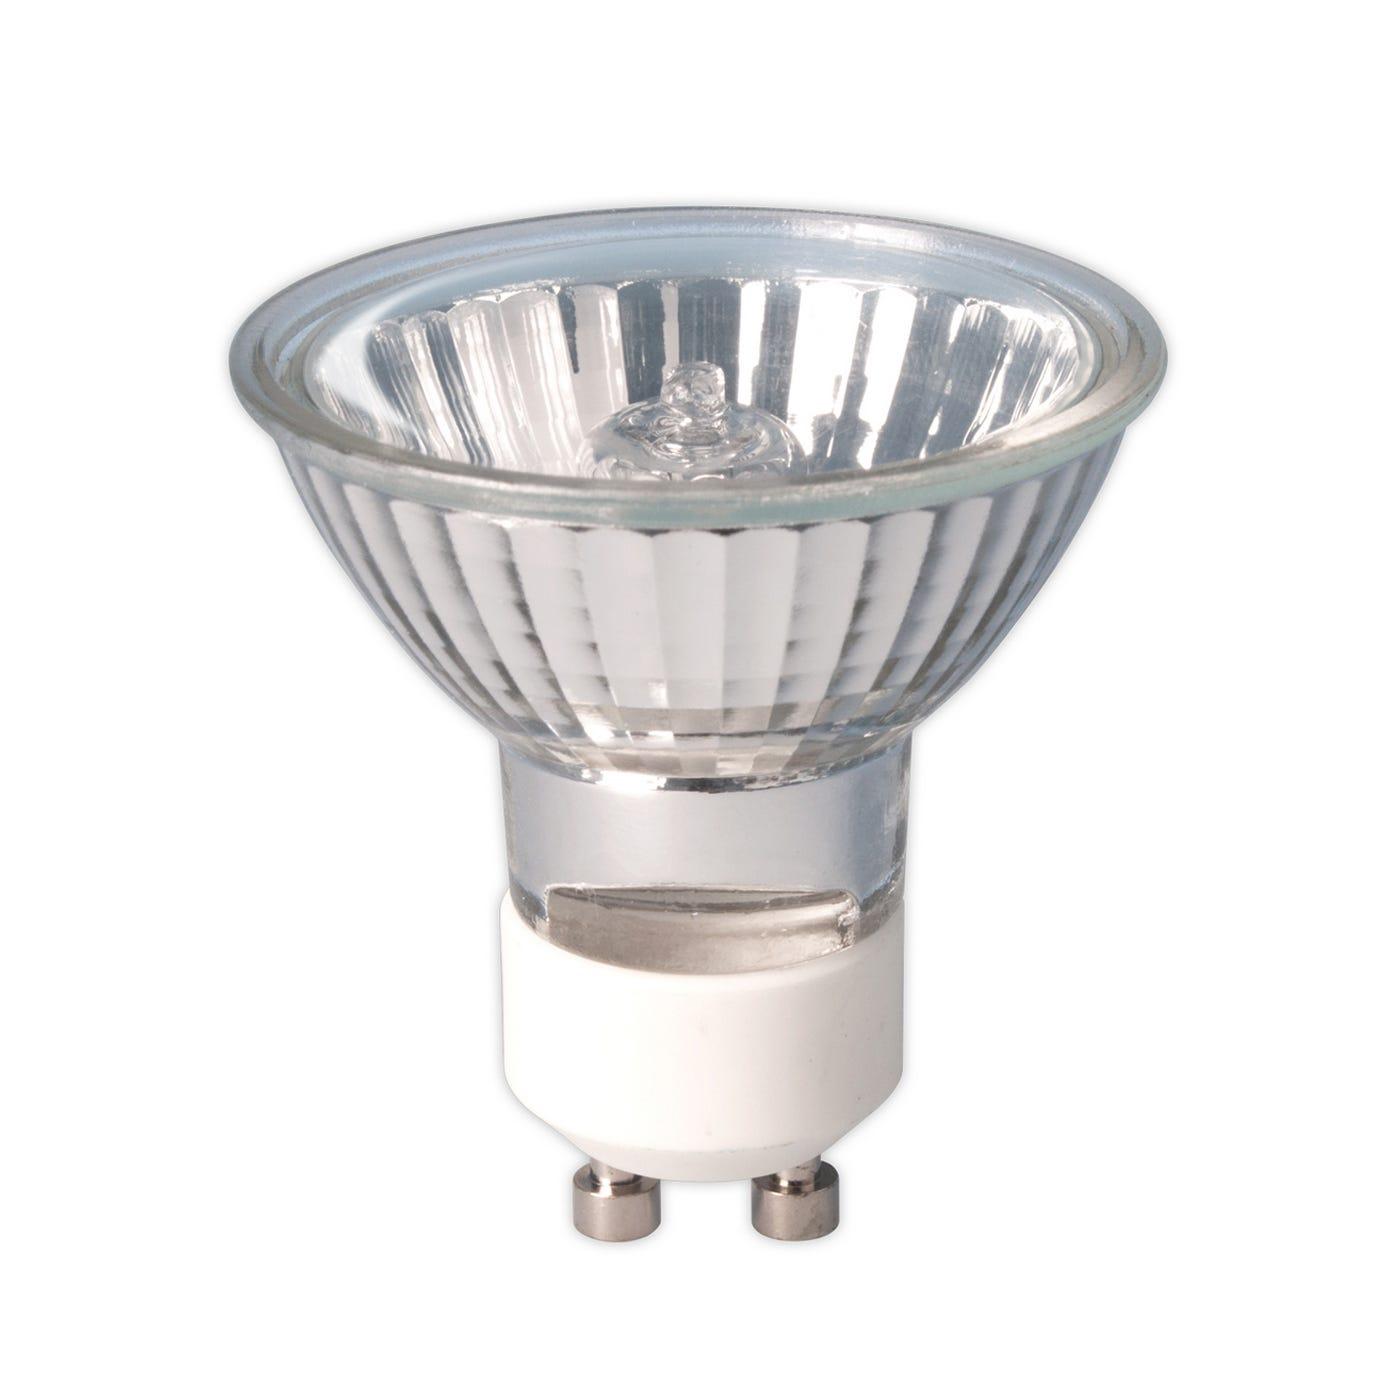 Halogen Lamp 40W GU10